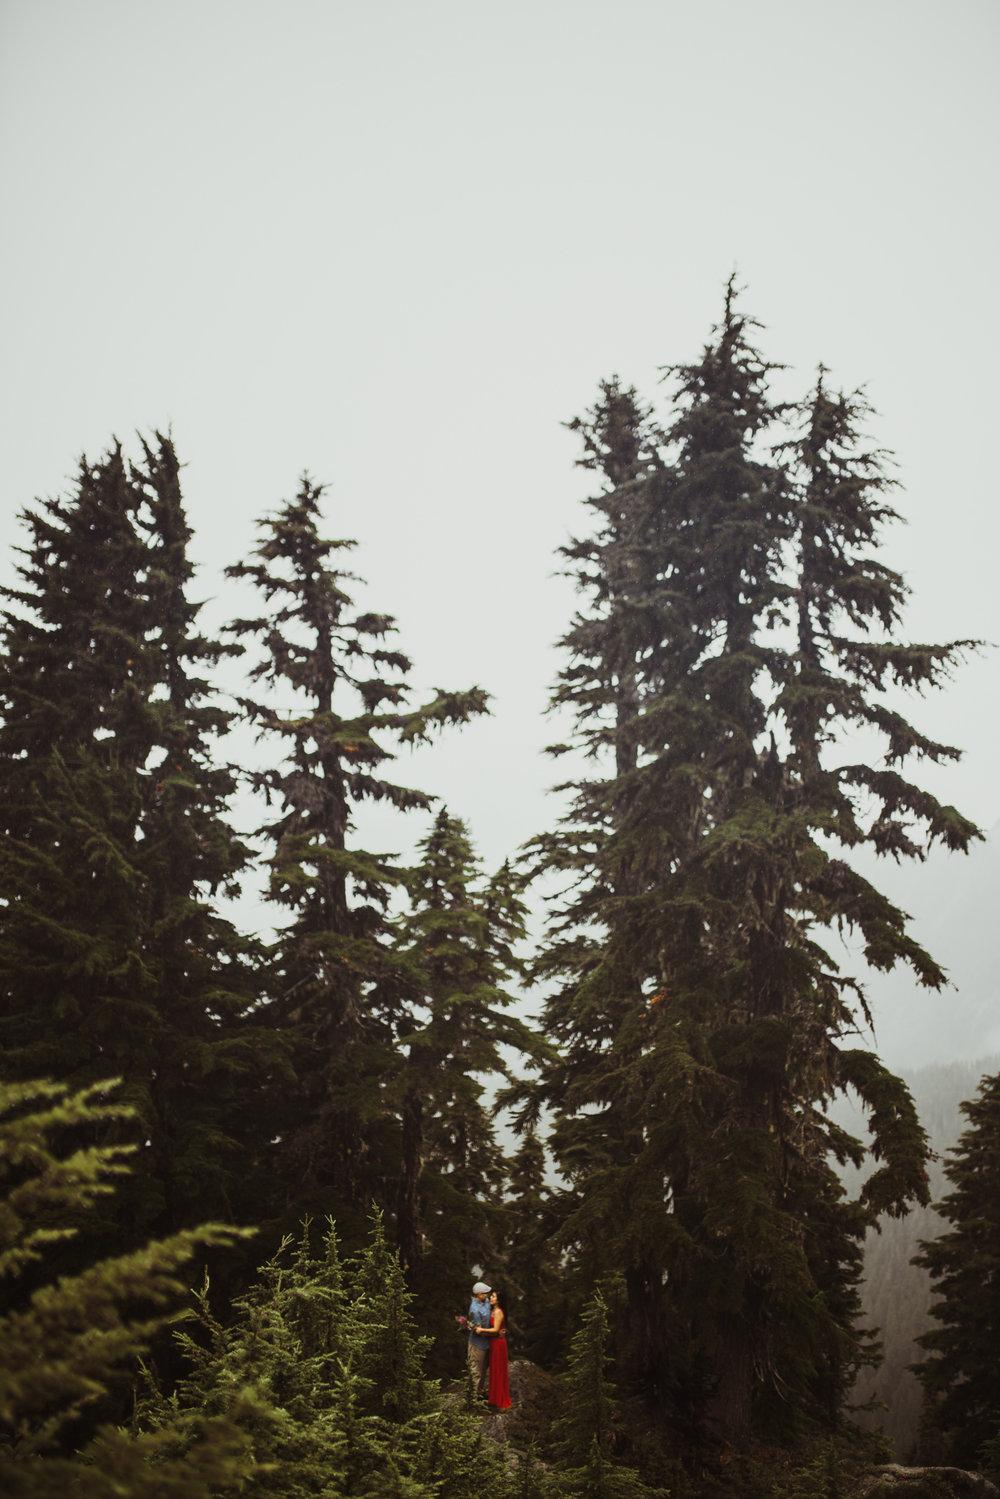 ©Isaiah-&-Taylor-Photography---Hidden-Lake-Cascade-Mountains-Engagement,-Washington-054.jpg